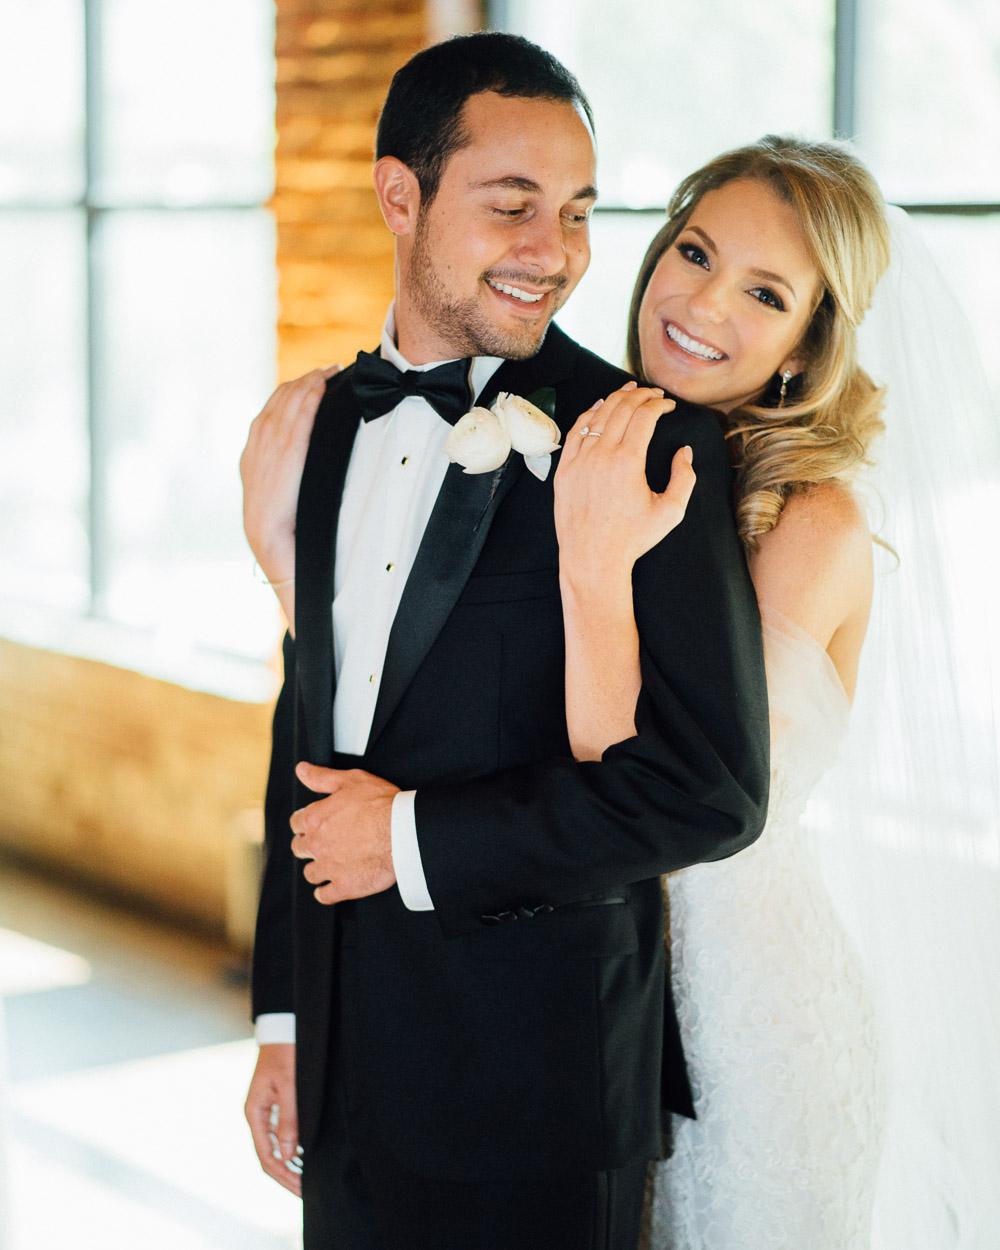 nashville-wedding-photographer-14 Downtown Nashville Wedding | Andrea + Ted | The aVenue